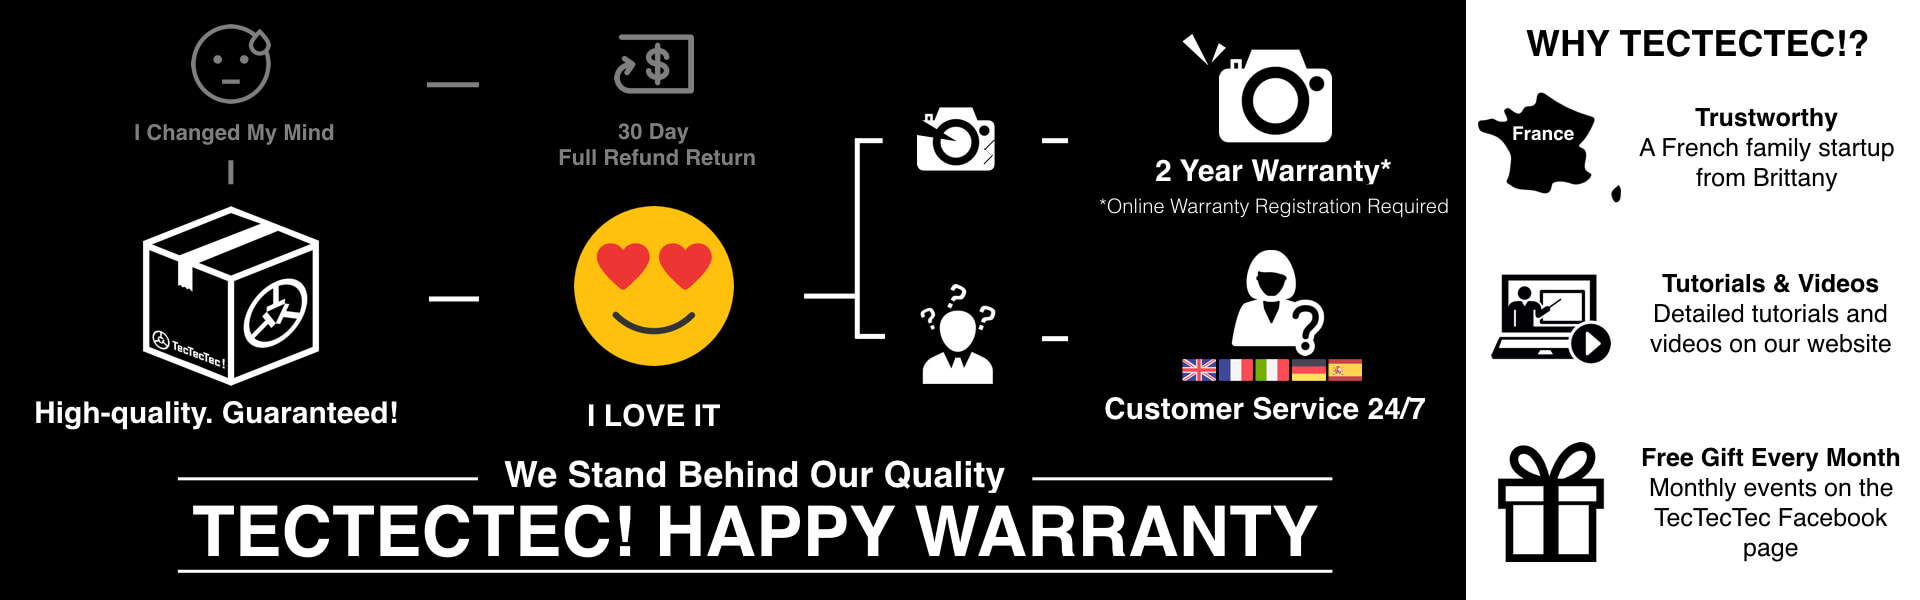 webhappywarranty-001